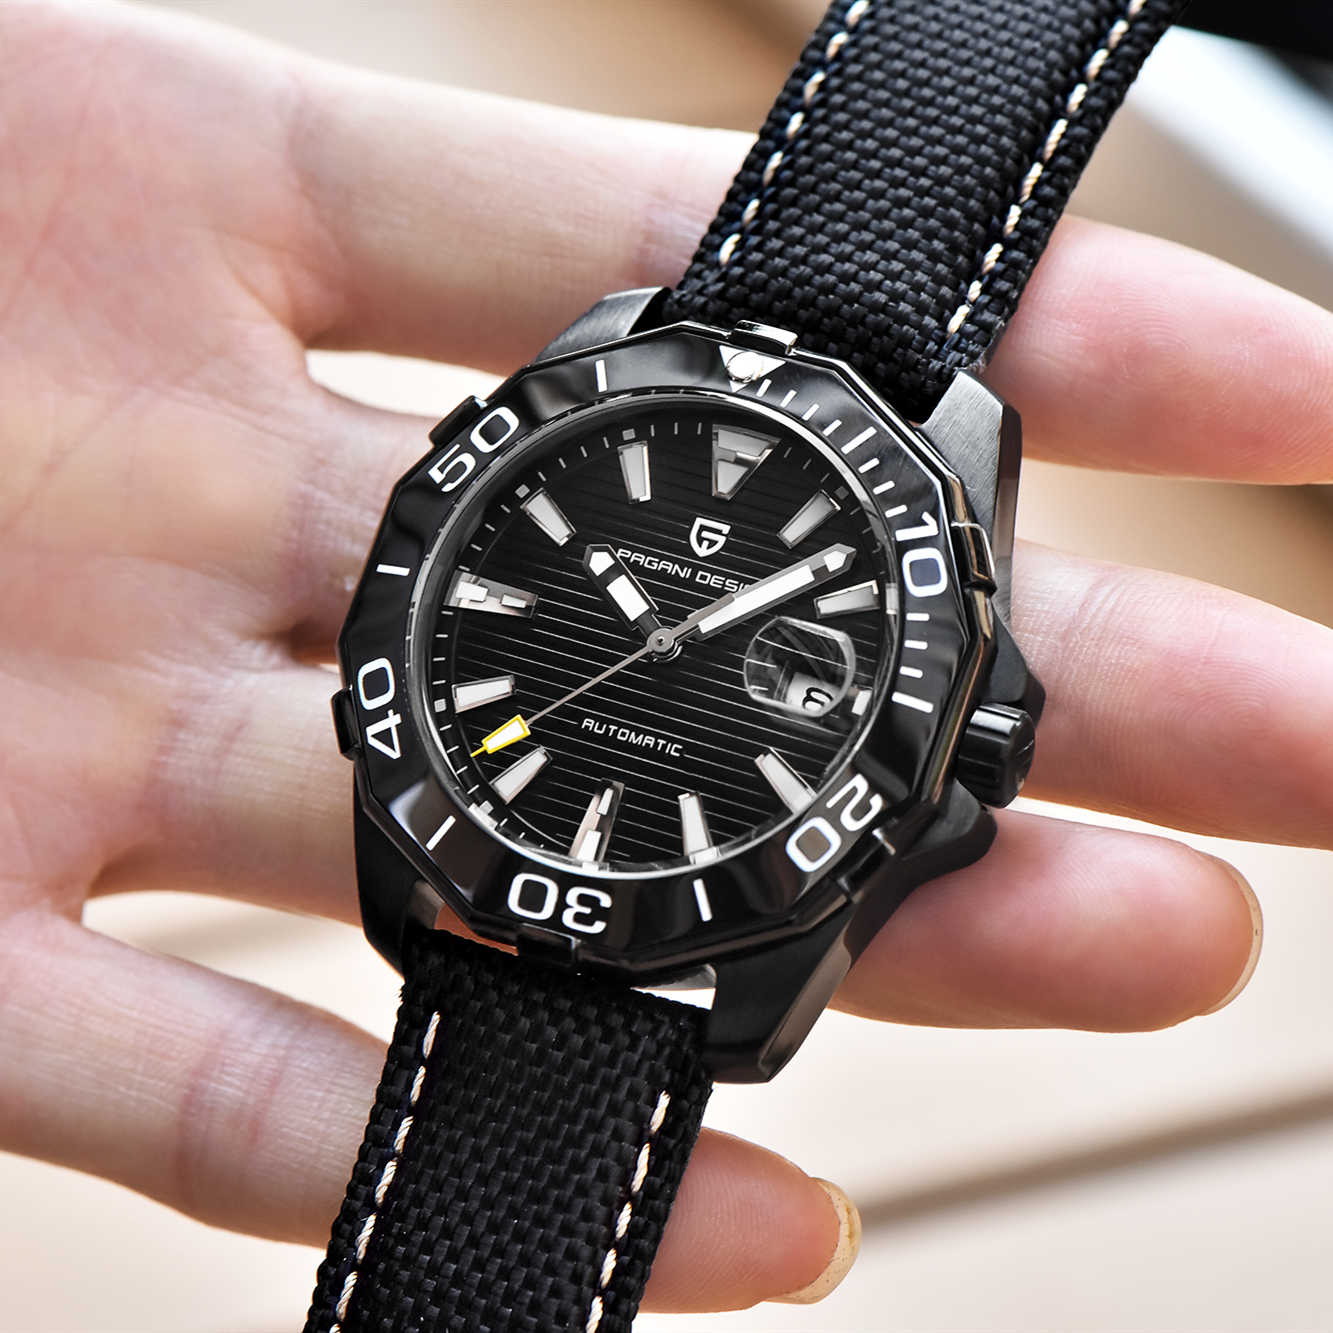 PAGANI DESIGN Men's Classic Diving Series Mechanical Watches Waterproof Steel Stainless Luxury Brand Watch Men Relogio Masculino